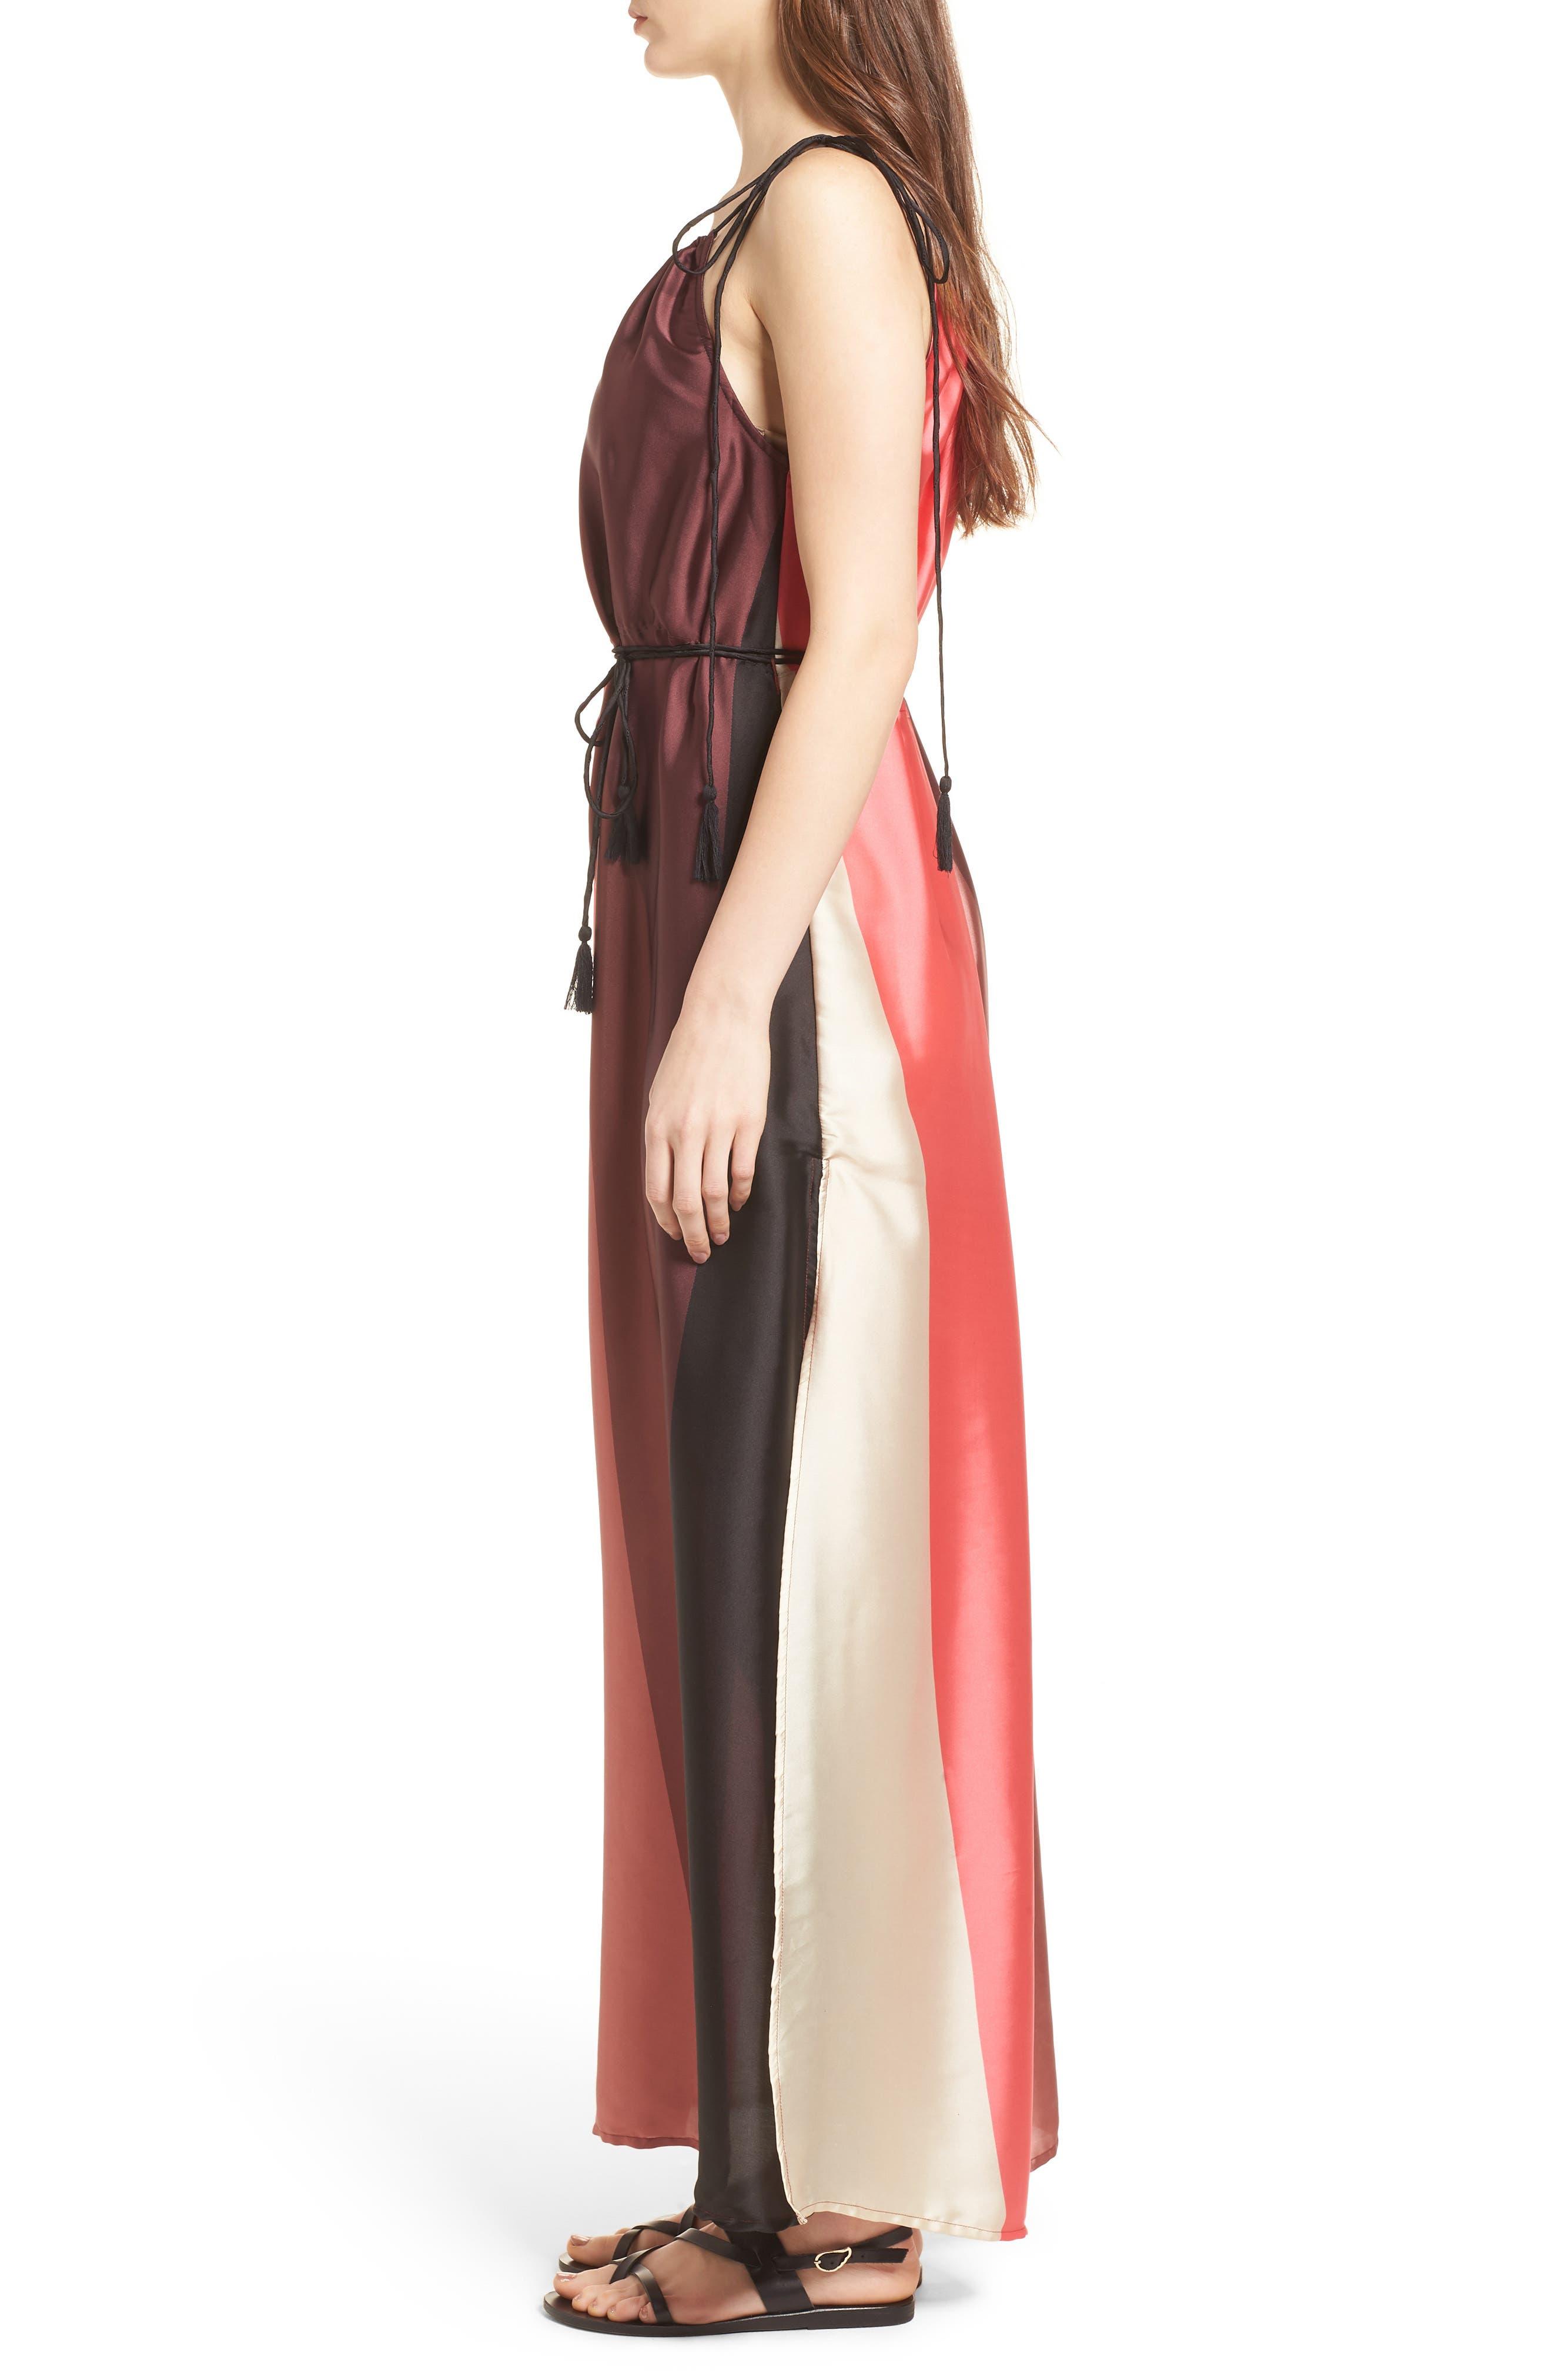 Icy Shores Maxi Dress,                             Alternate thumbnail 3, color,                             903